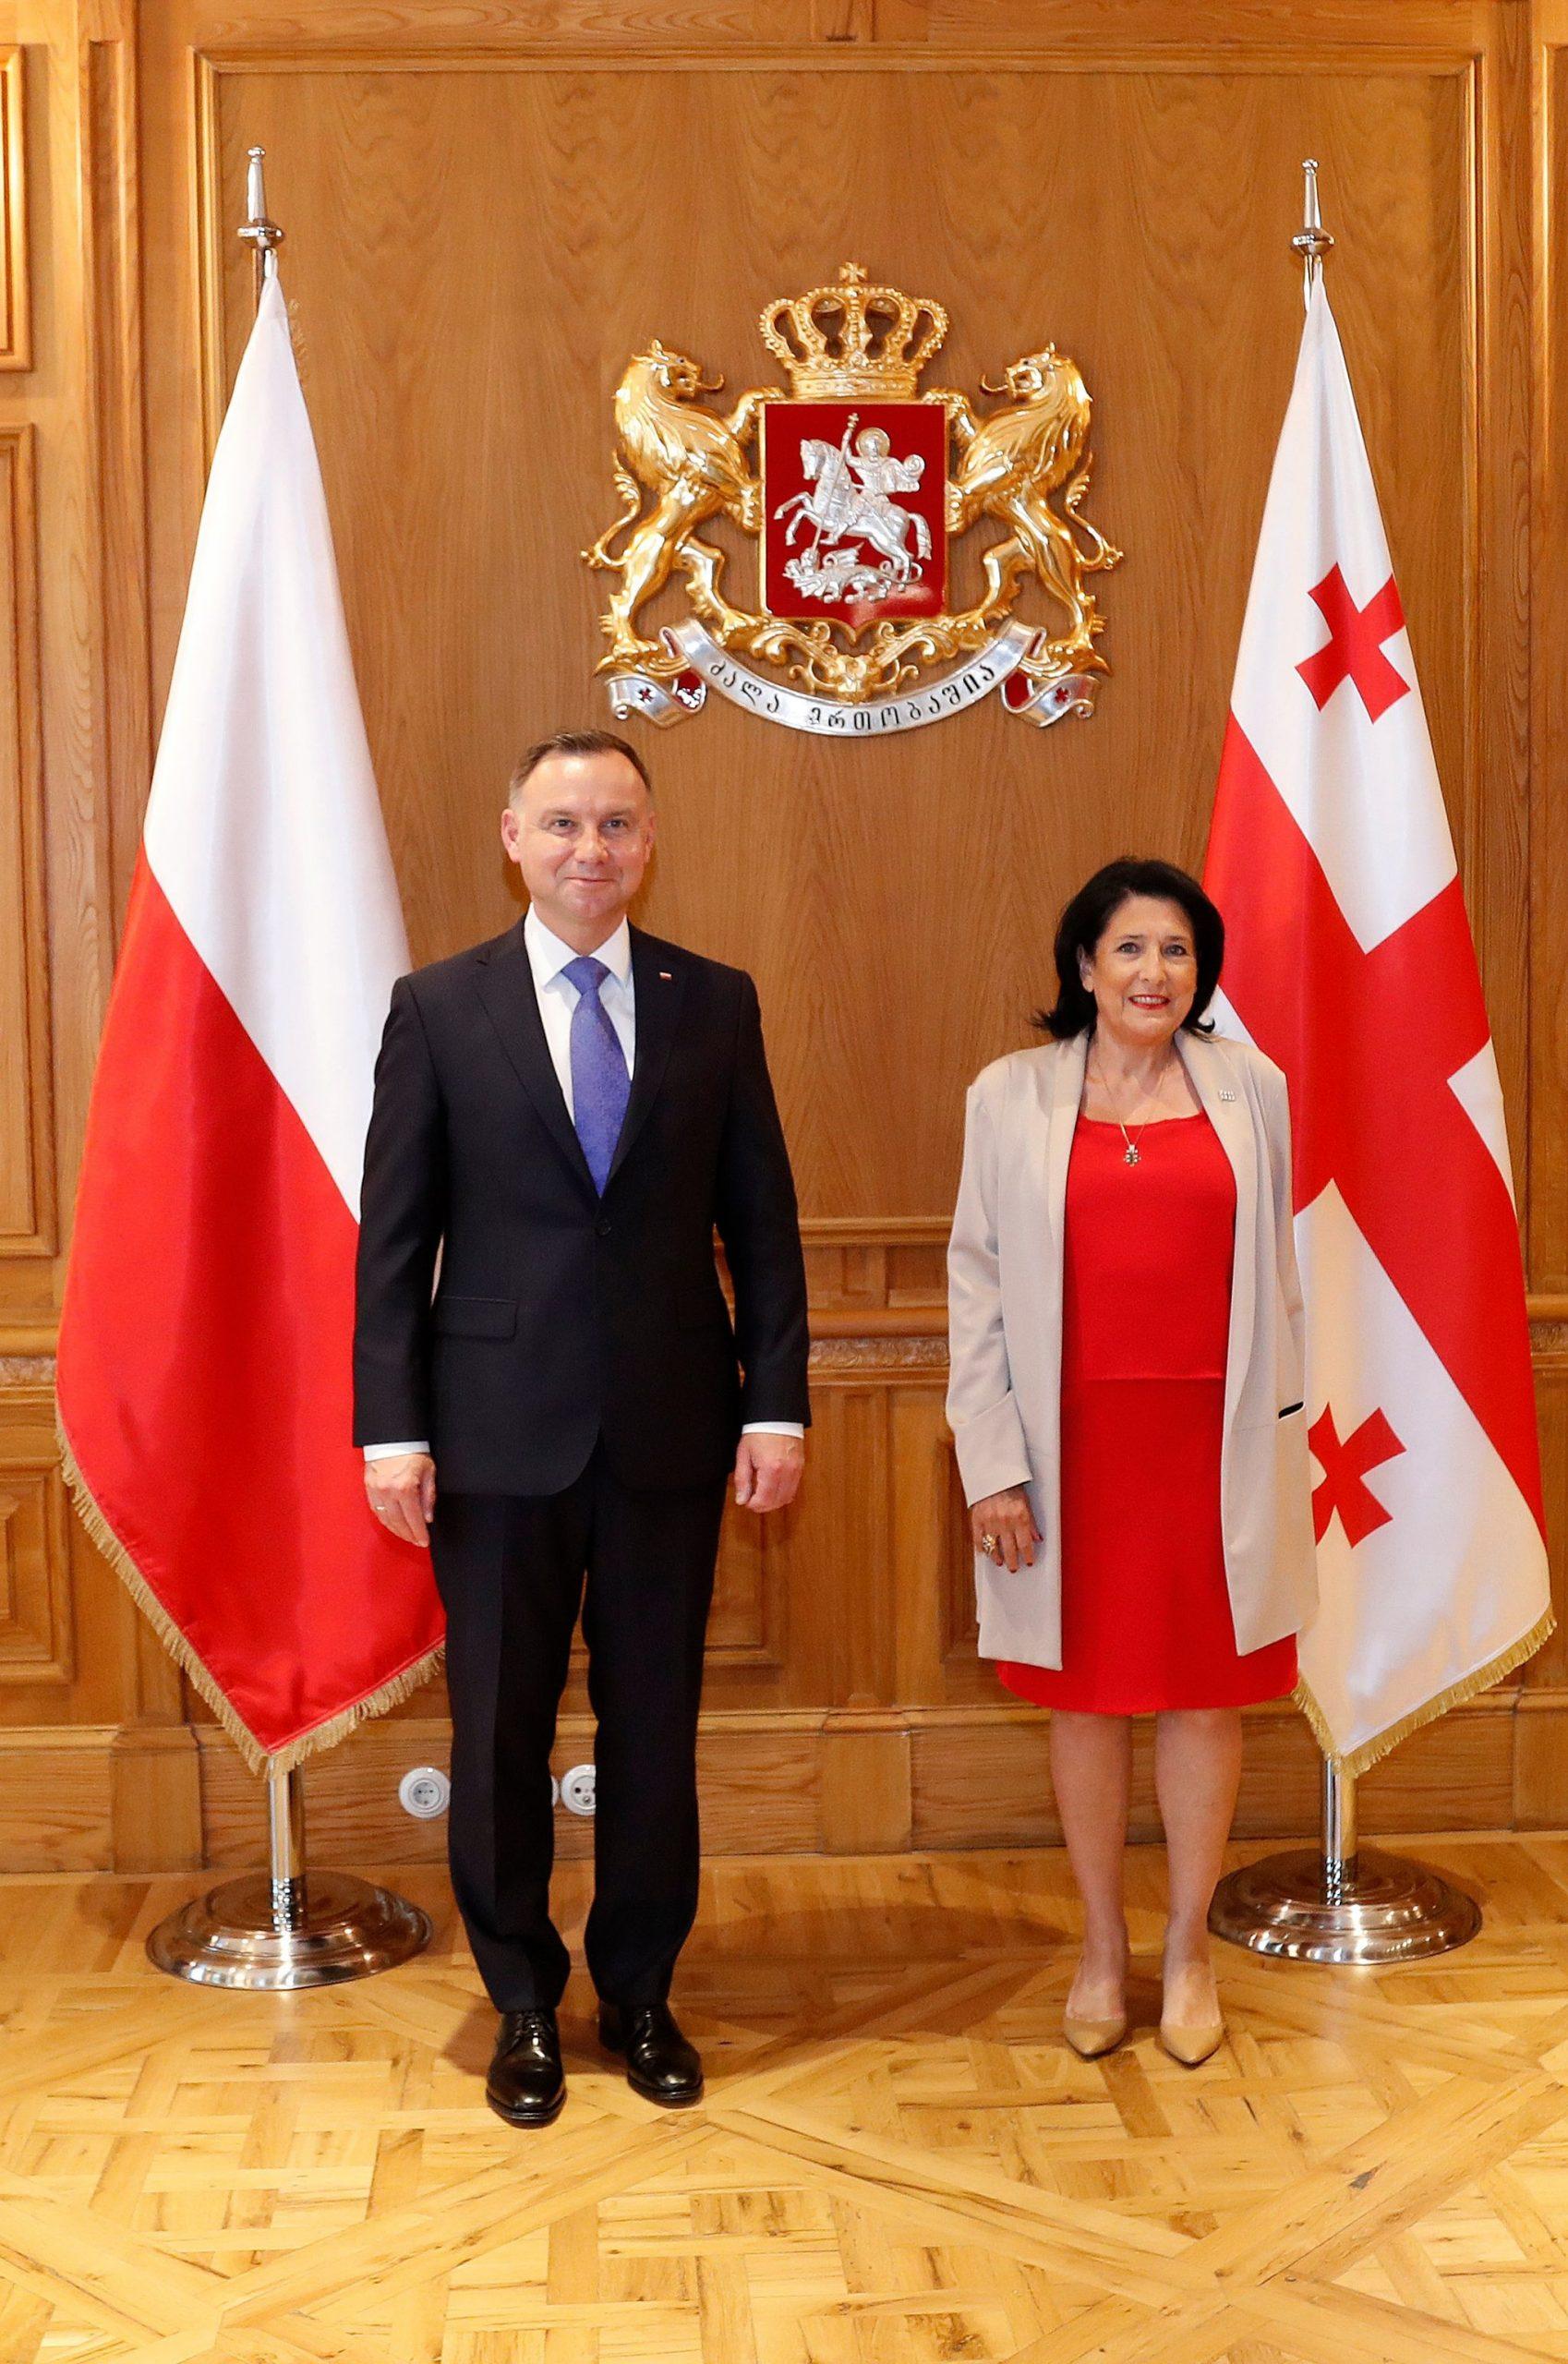 Zourabishvili Duda 2 scaled #новости Анджей Дуда, Грузия-ЕС, Грузия-НАТО, Грузия-Польша, Польша